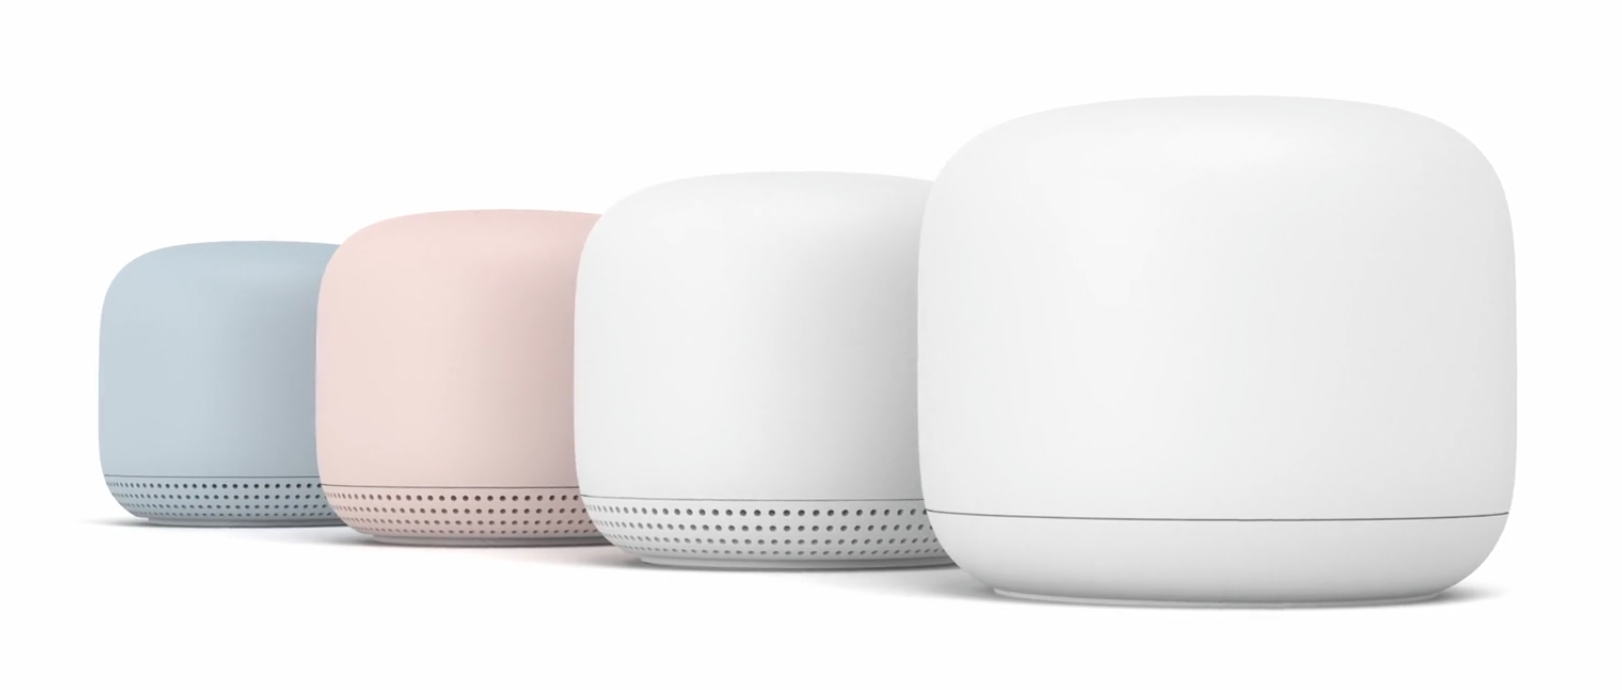 Google представил новые устройства: Pixel 4, Pixelbook Go, Pixel Buds, Nest Mini, Nest Wifi